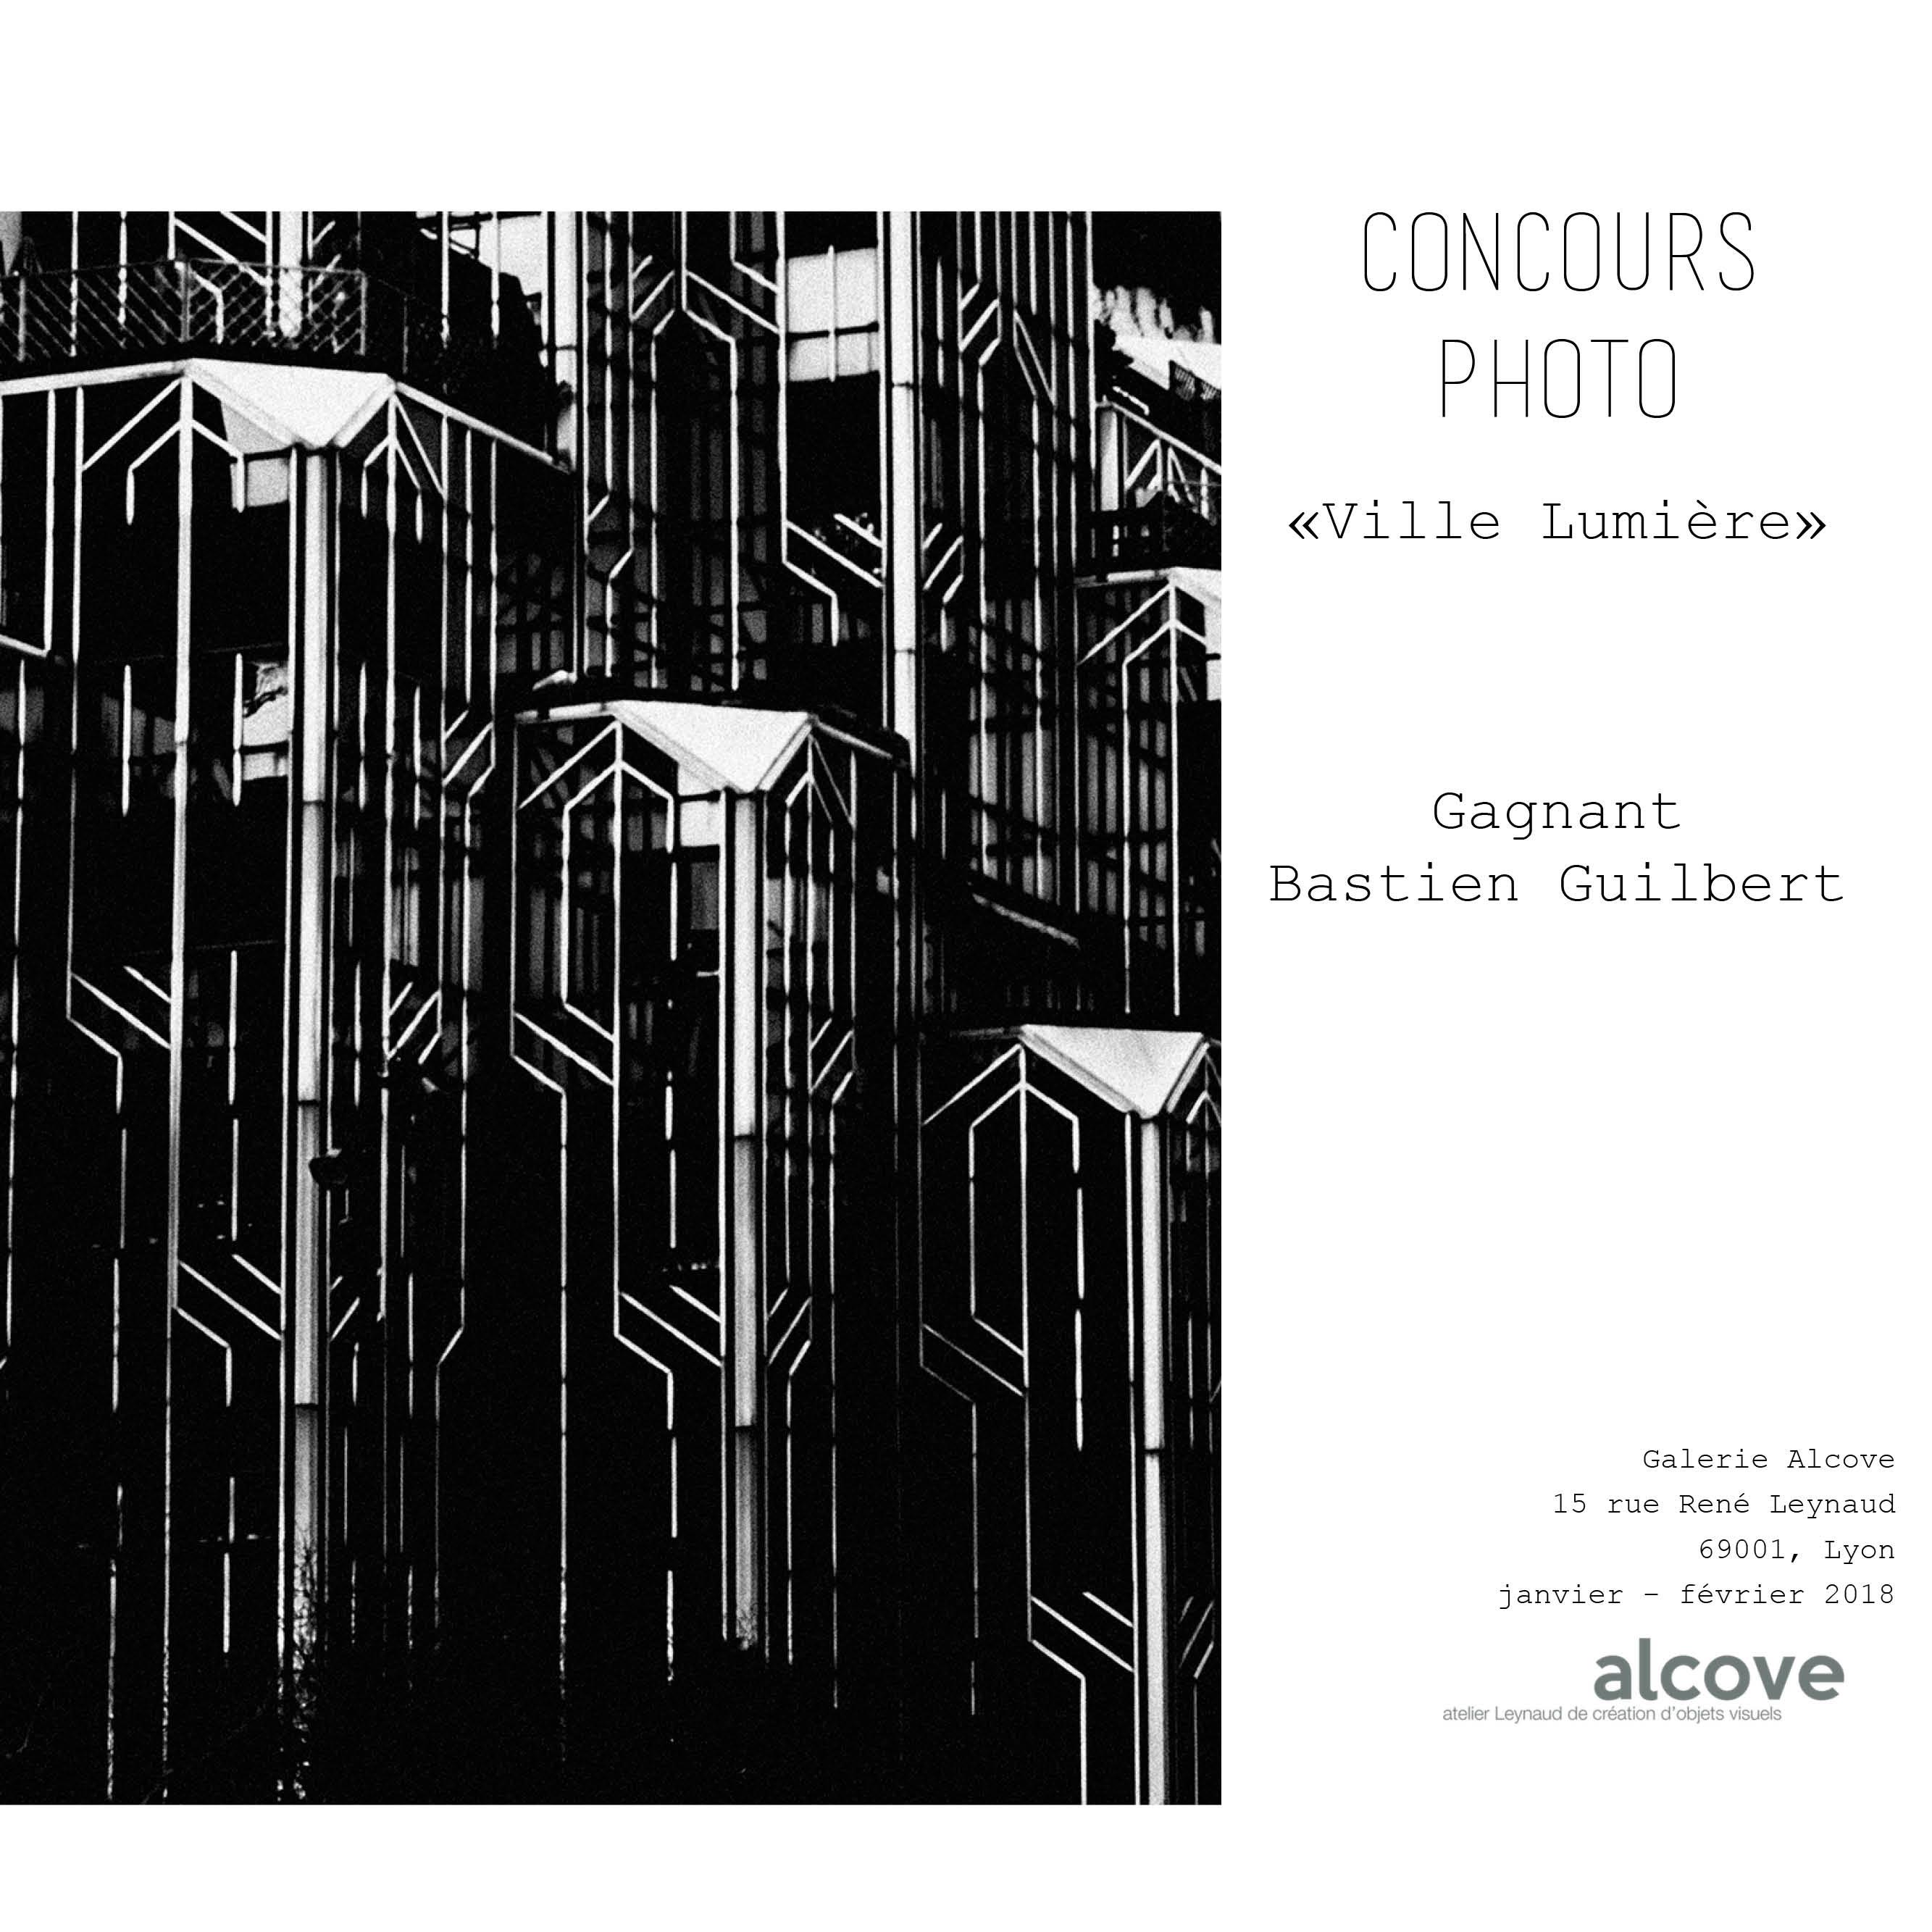 concours photo, Lyon, Alcove